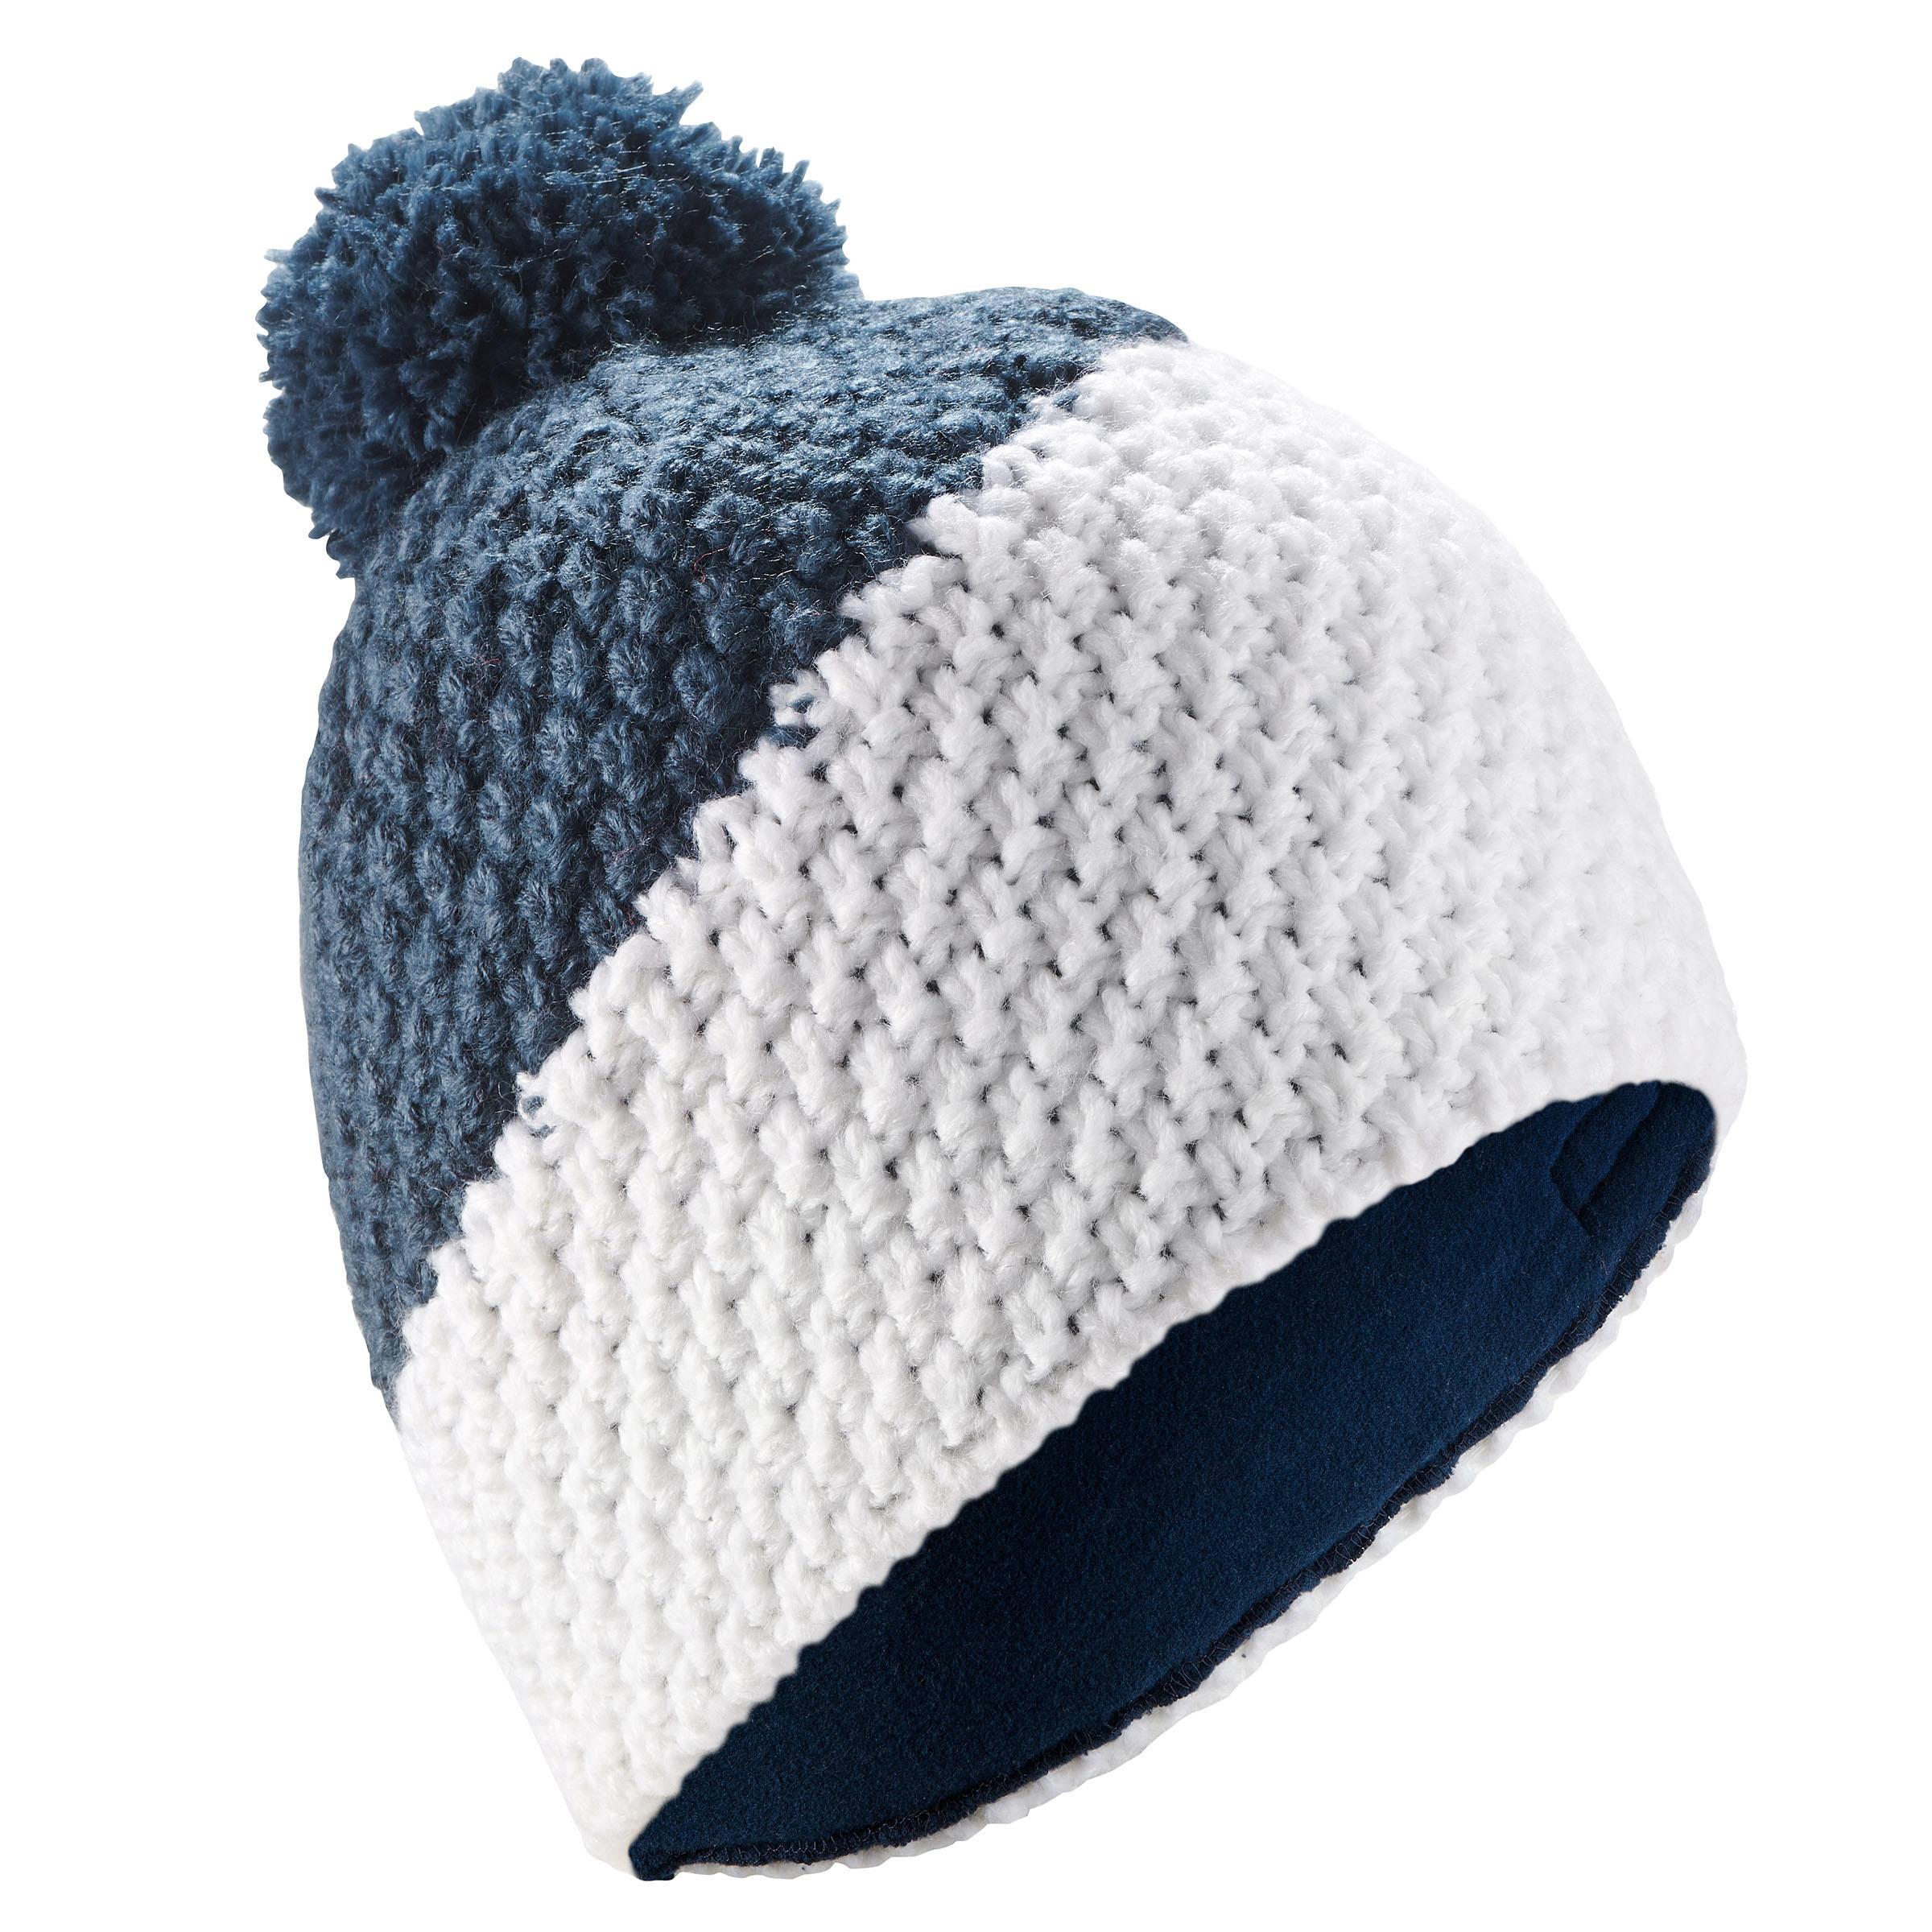 Skimütze Timeless Erwachsene weiß/blau | Accessoires > Mützen > Skimützen | Blau - Weiß | Wed'ze